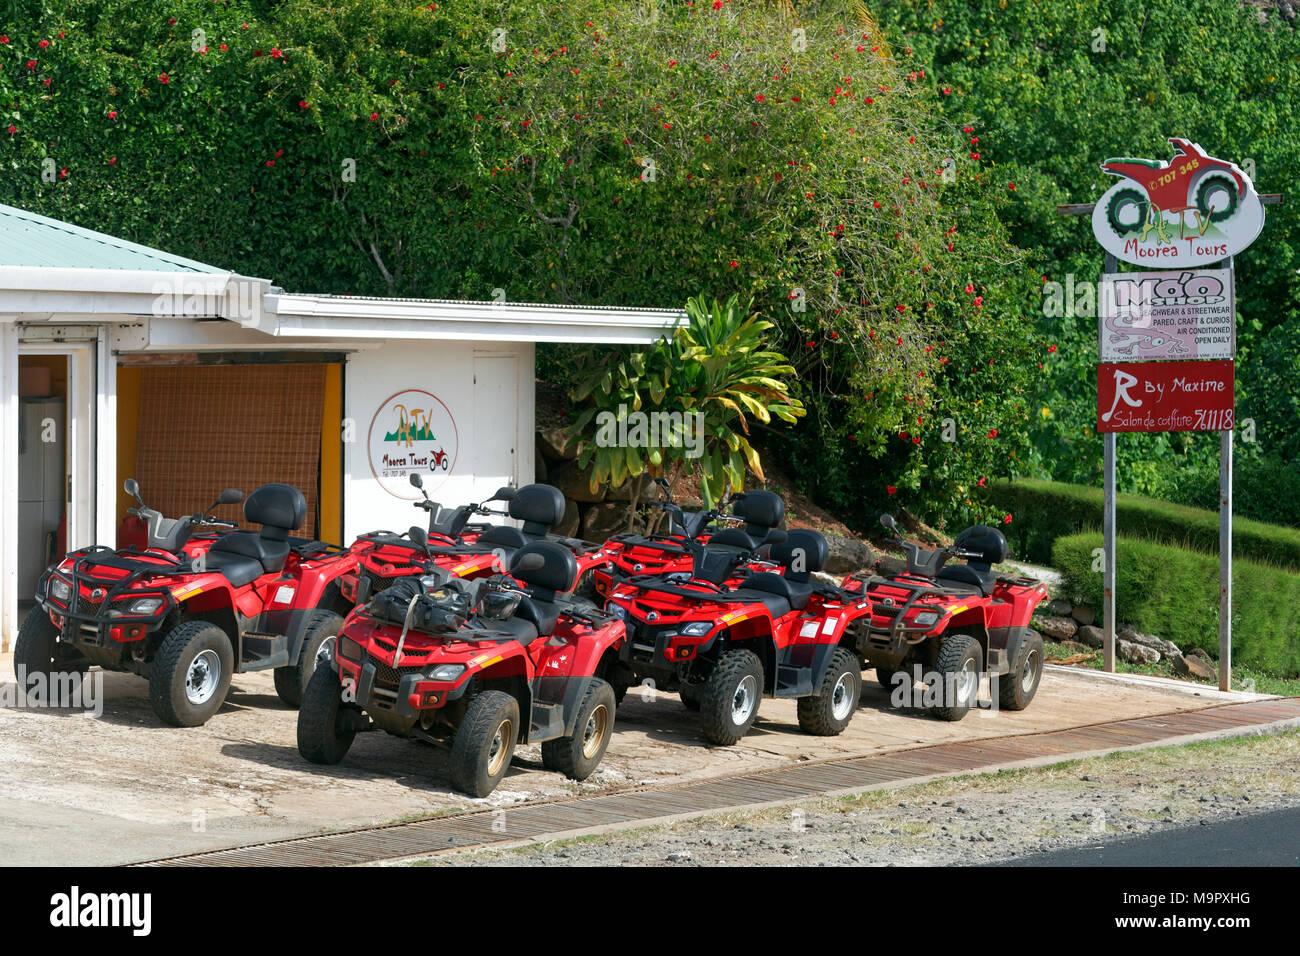 Quads of Moorea Tours, Moorea, Society Islands, Windward Islands, French Polynesia - Stock Image